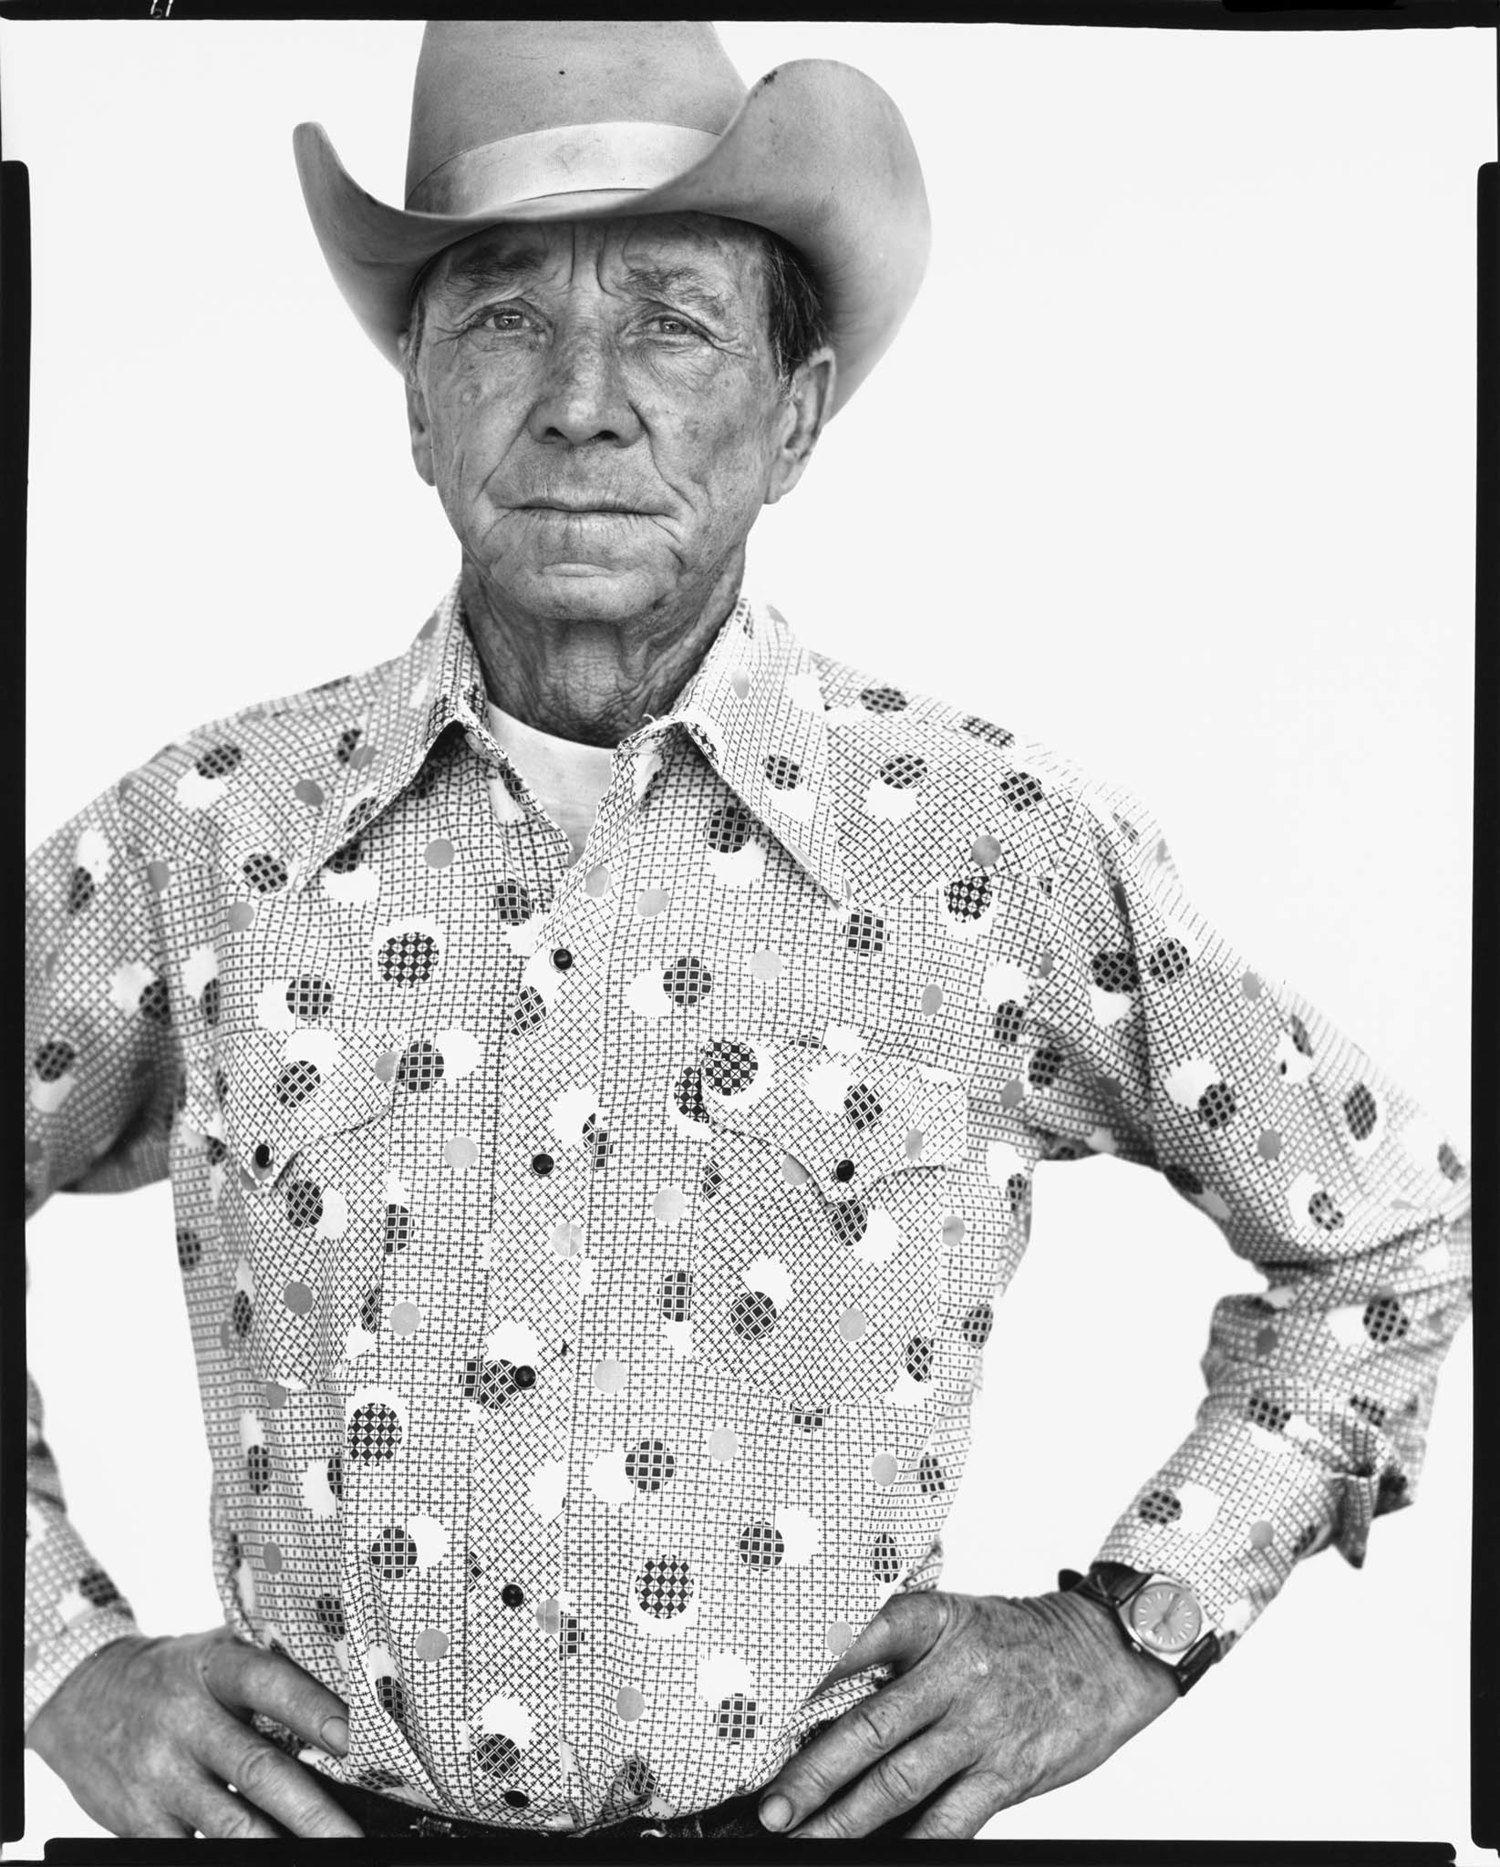 Wilbur Powell, Rancher, Ennis, Montana, July 4, 1978